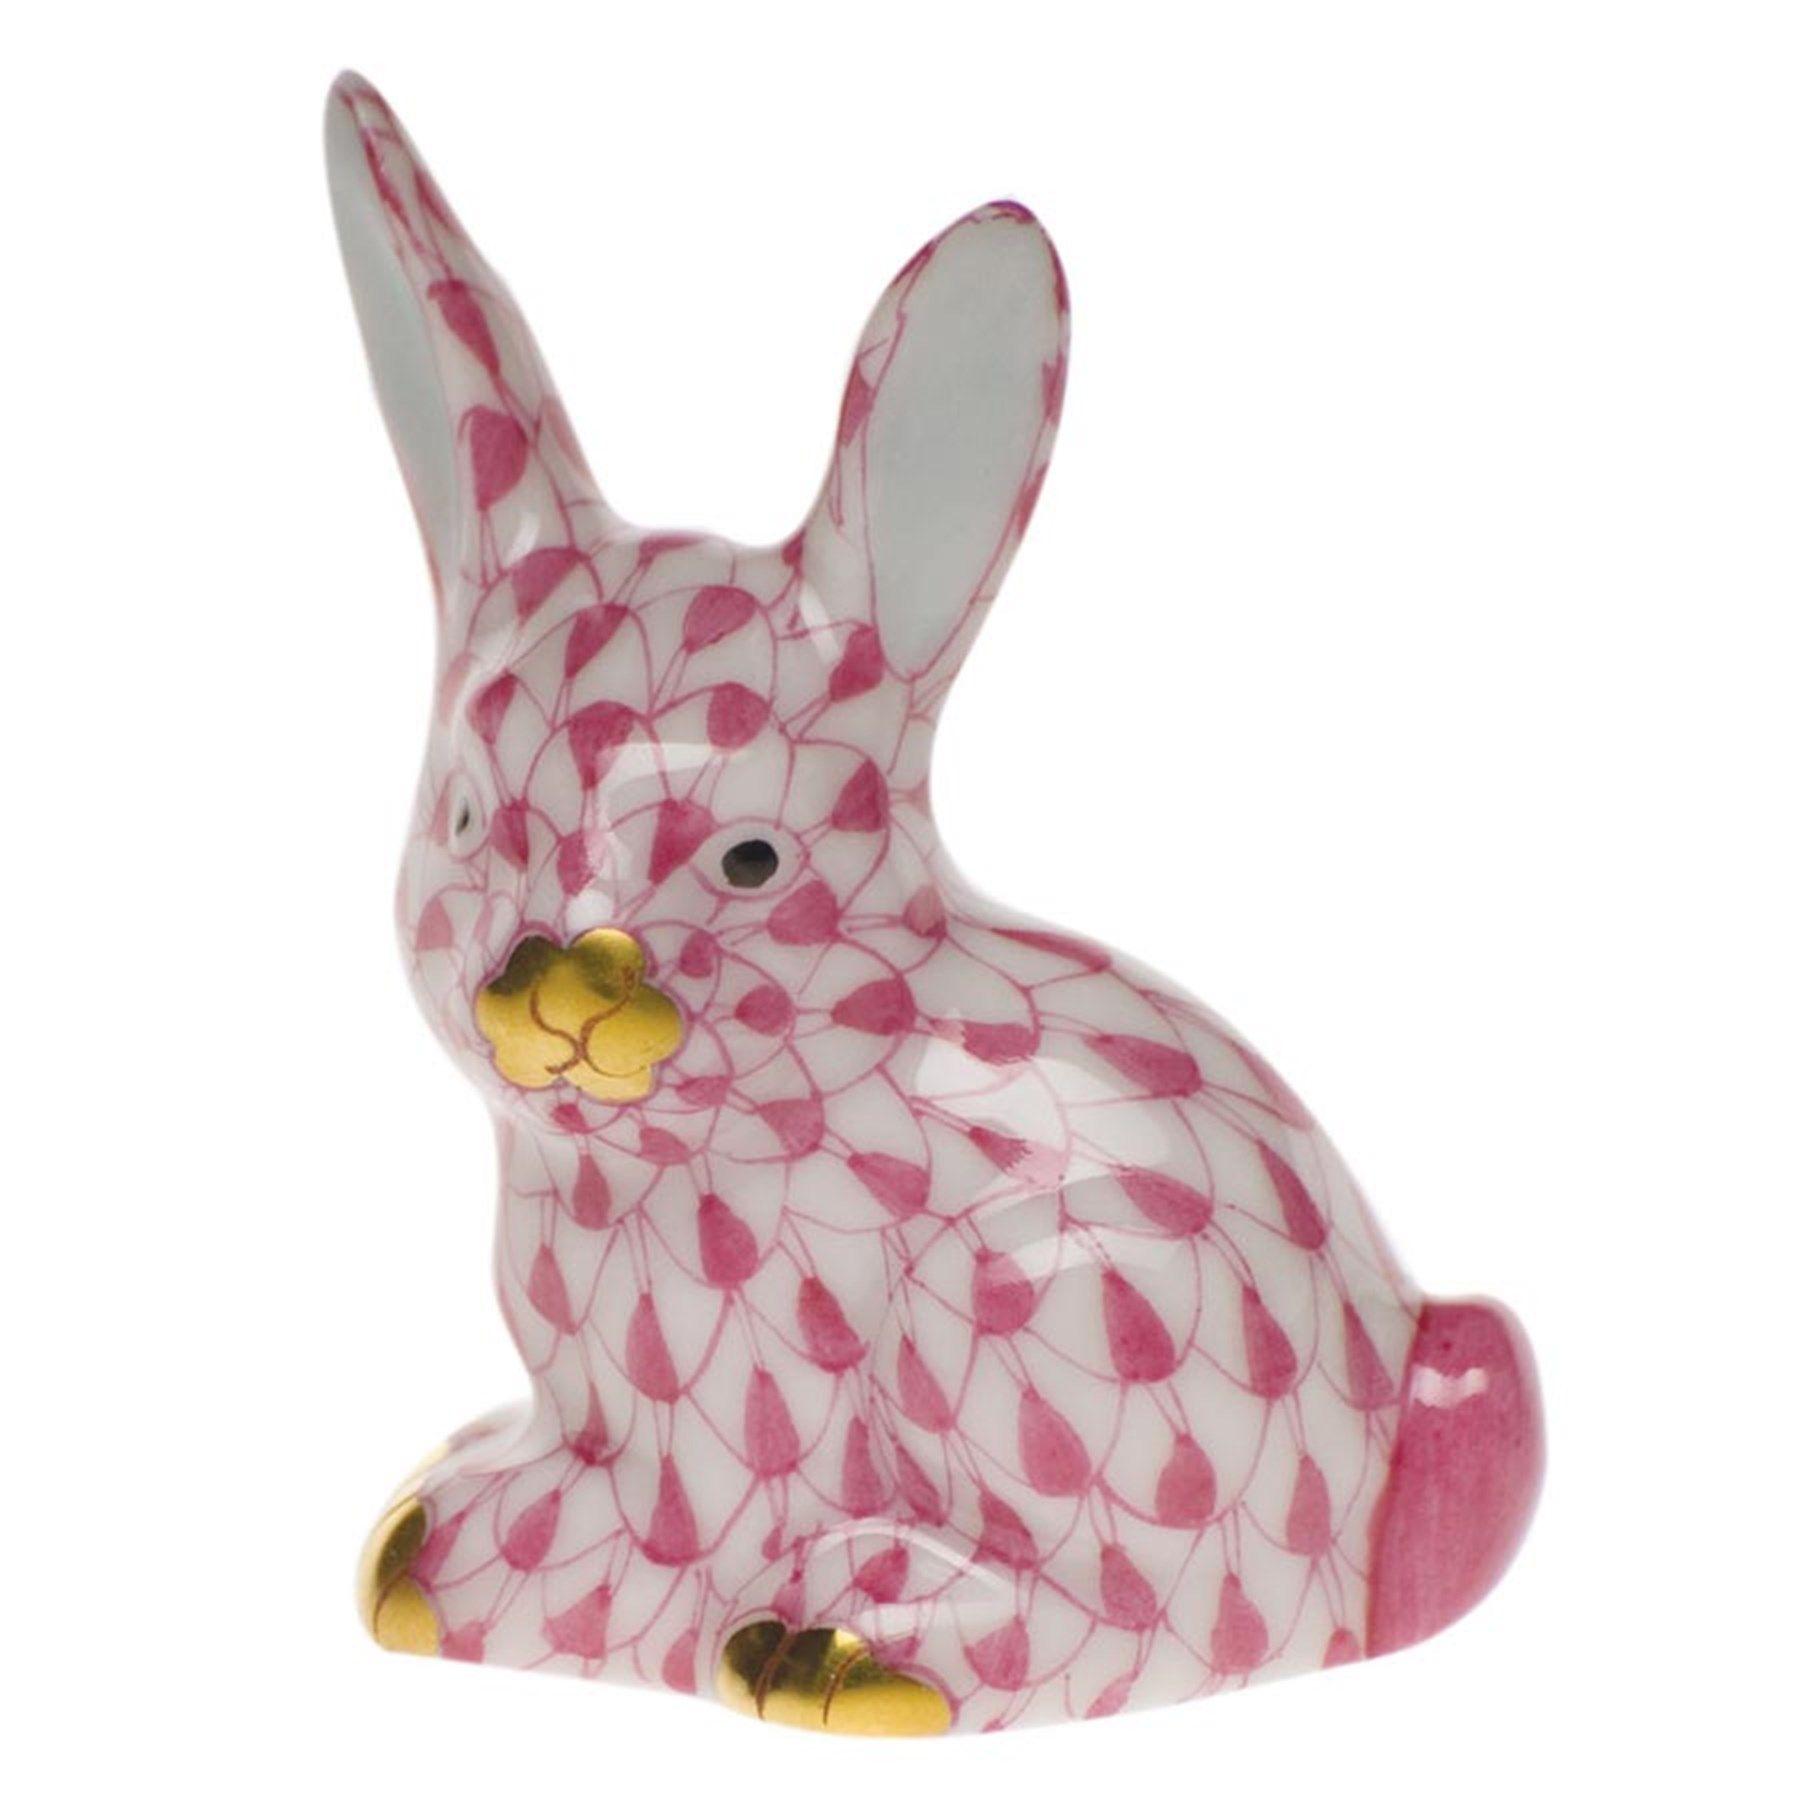 "Herend Kangaroo Hand Painted Porcelain Figurine In Pink: 175 1 ¼"" X 7⁄8"" X 1 ½""h"